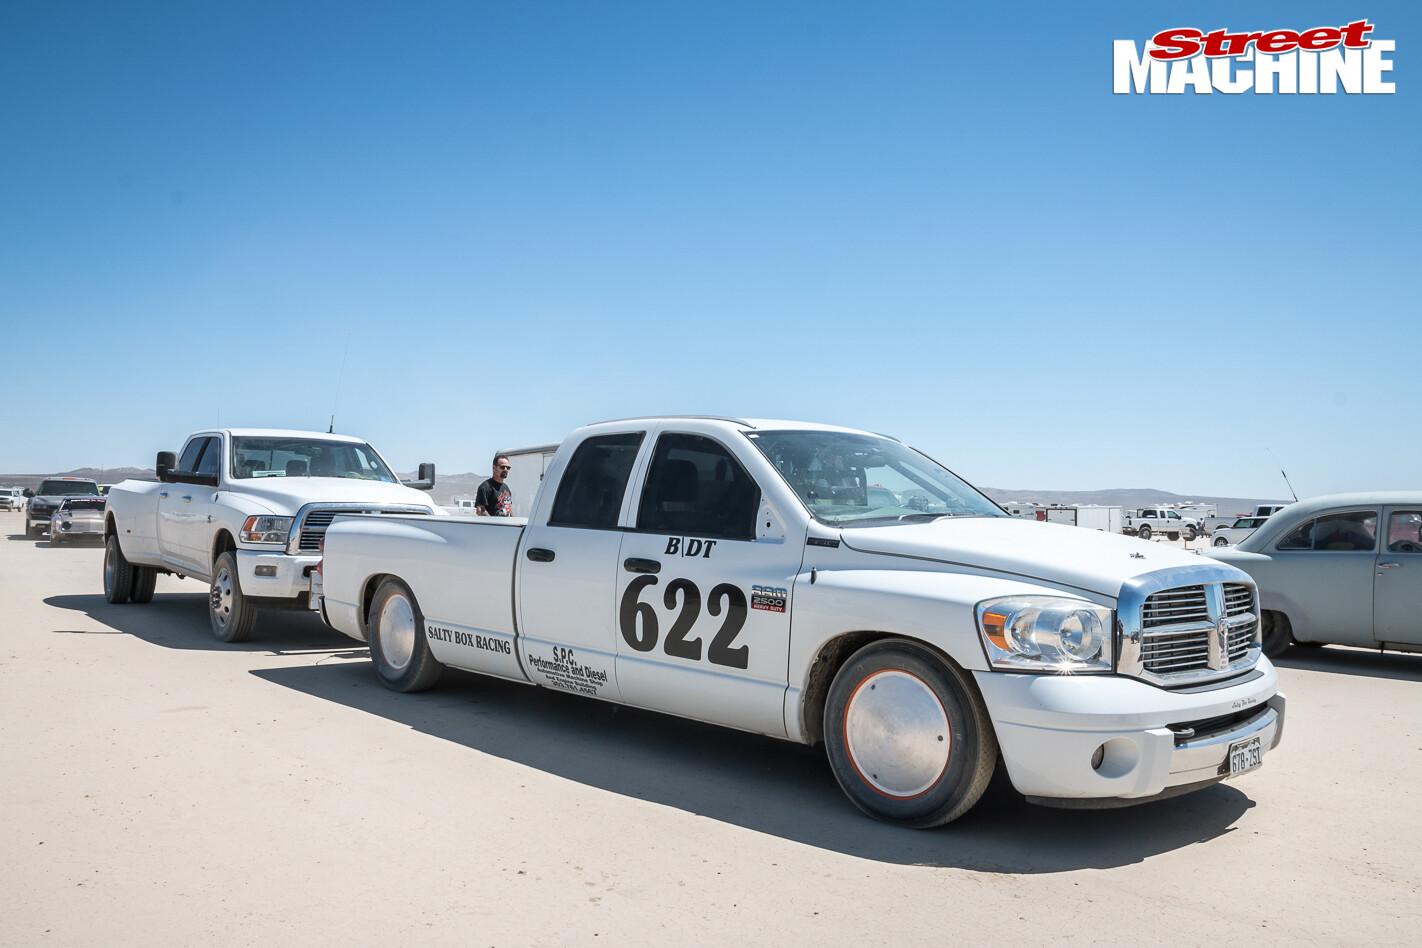 Dodge -Ram -El -Mirage -Salty -Box -Racing -0591